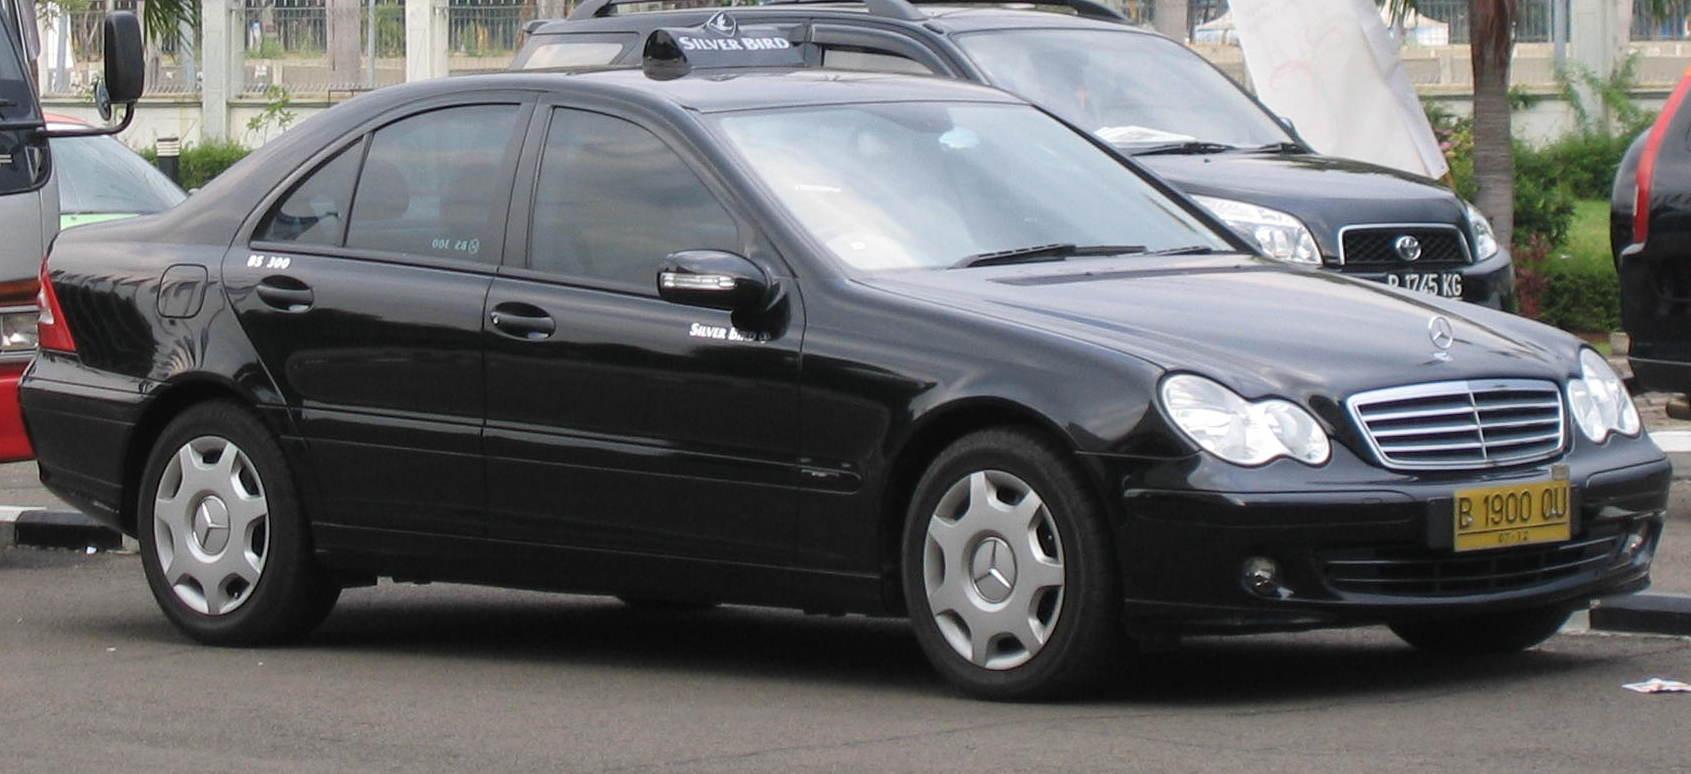 Mercedes Benz Indonesia Wanaherang